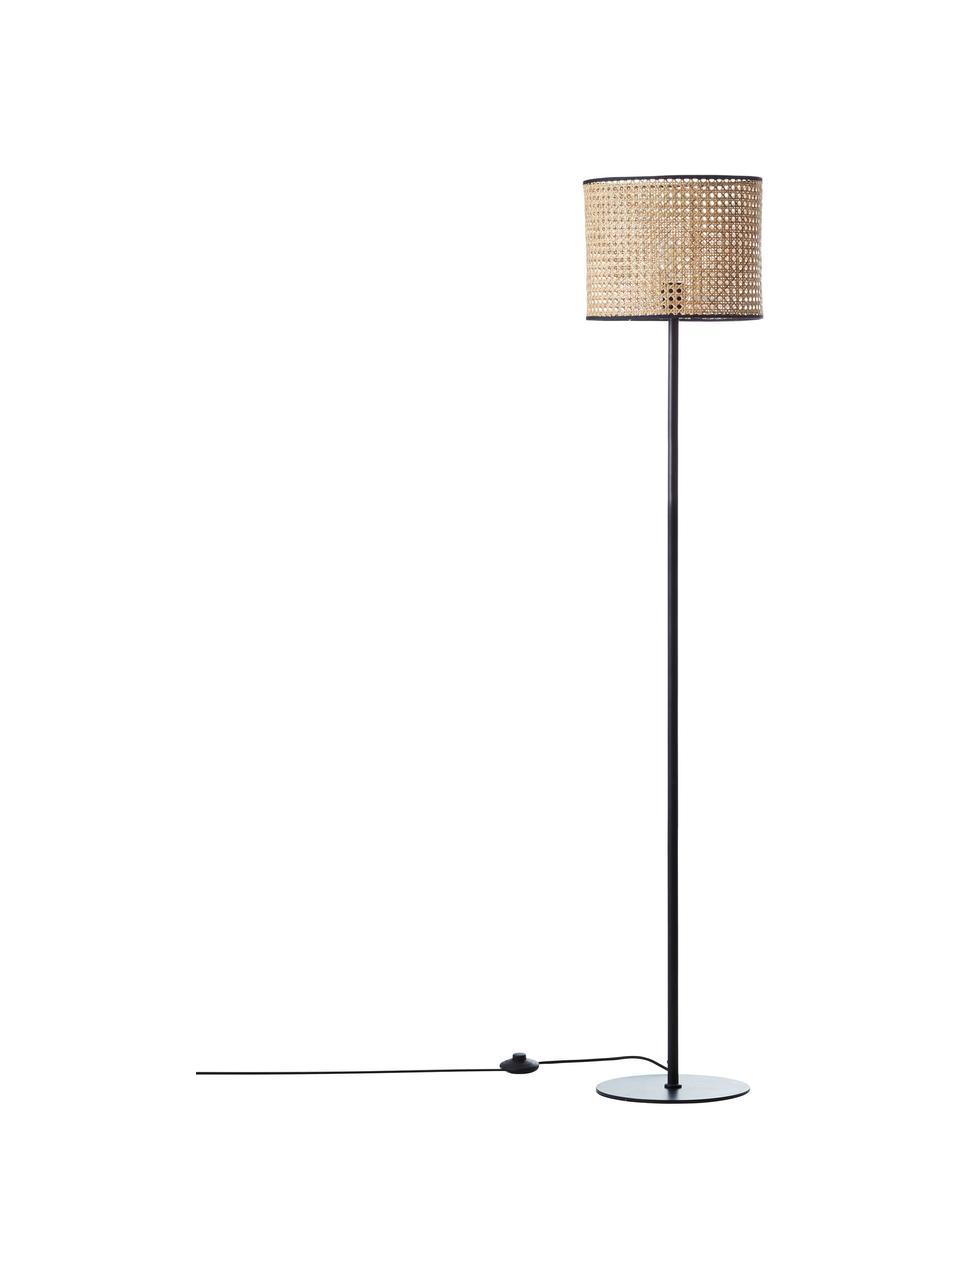 Vloerlamp Wiley met rotan kap, Lampenkap: rotan, Lampvoet: metaal, Rotan, zwart, Ø 30 x H 154 cm